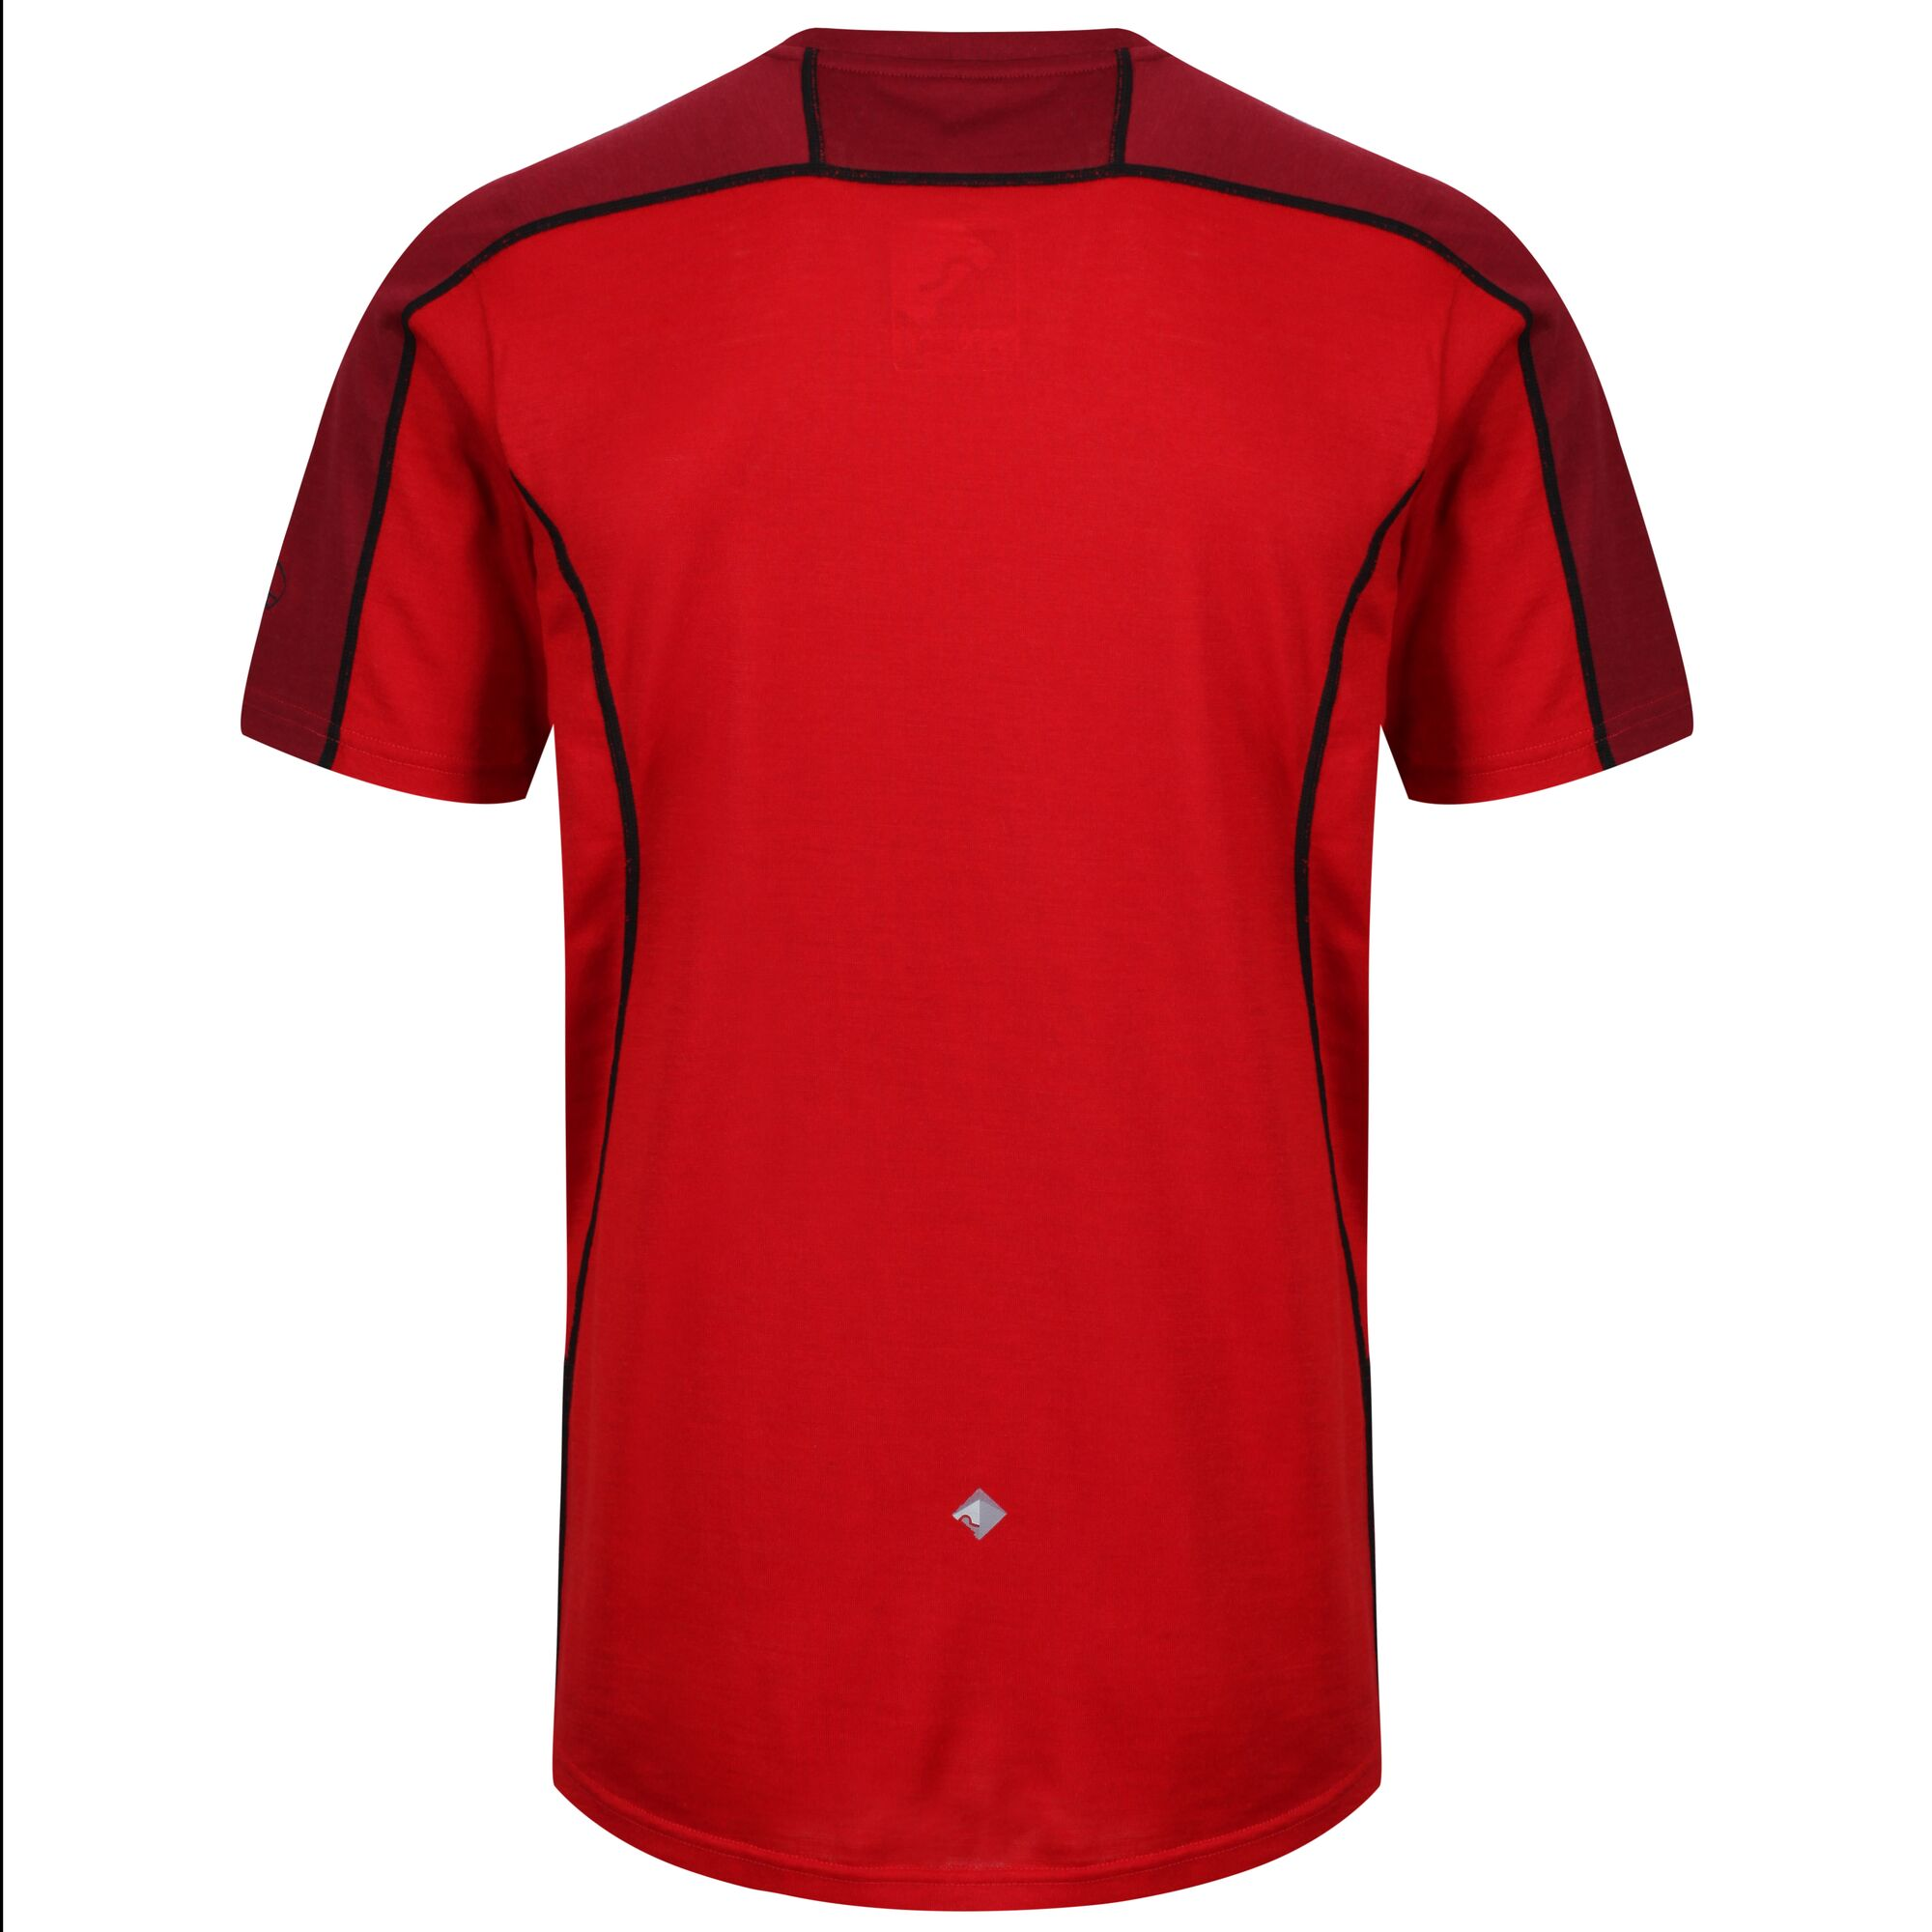 Regatta Mens Tornell Super Soft Merino Wool T-Shirt (S) (Classic Red/Delhi Red)